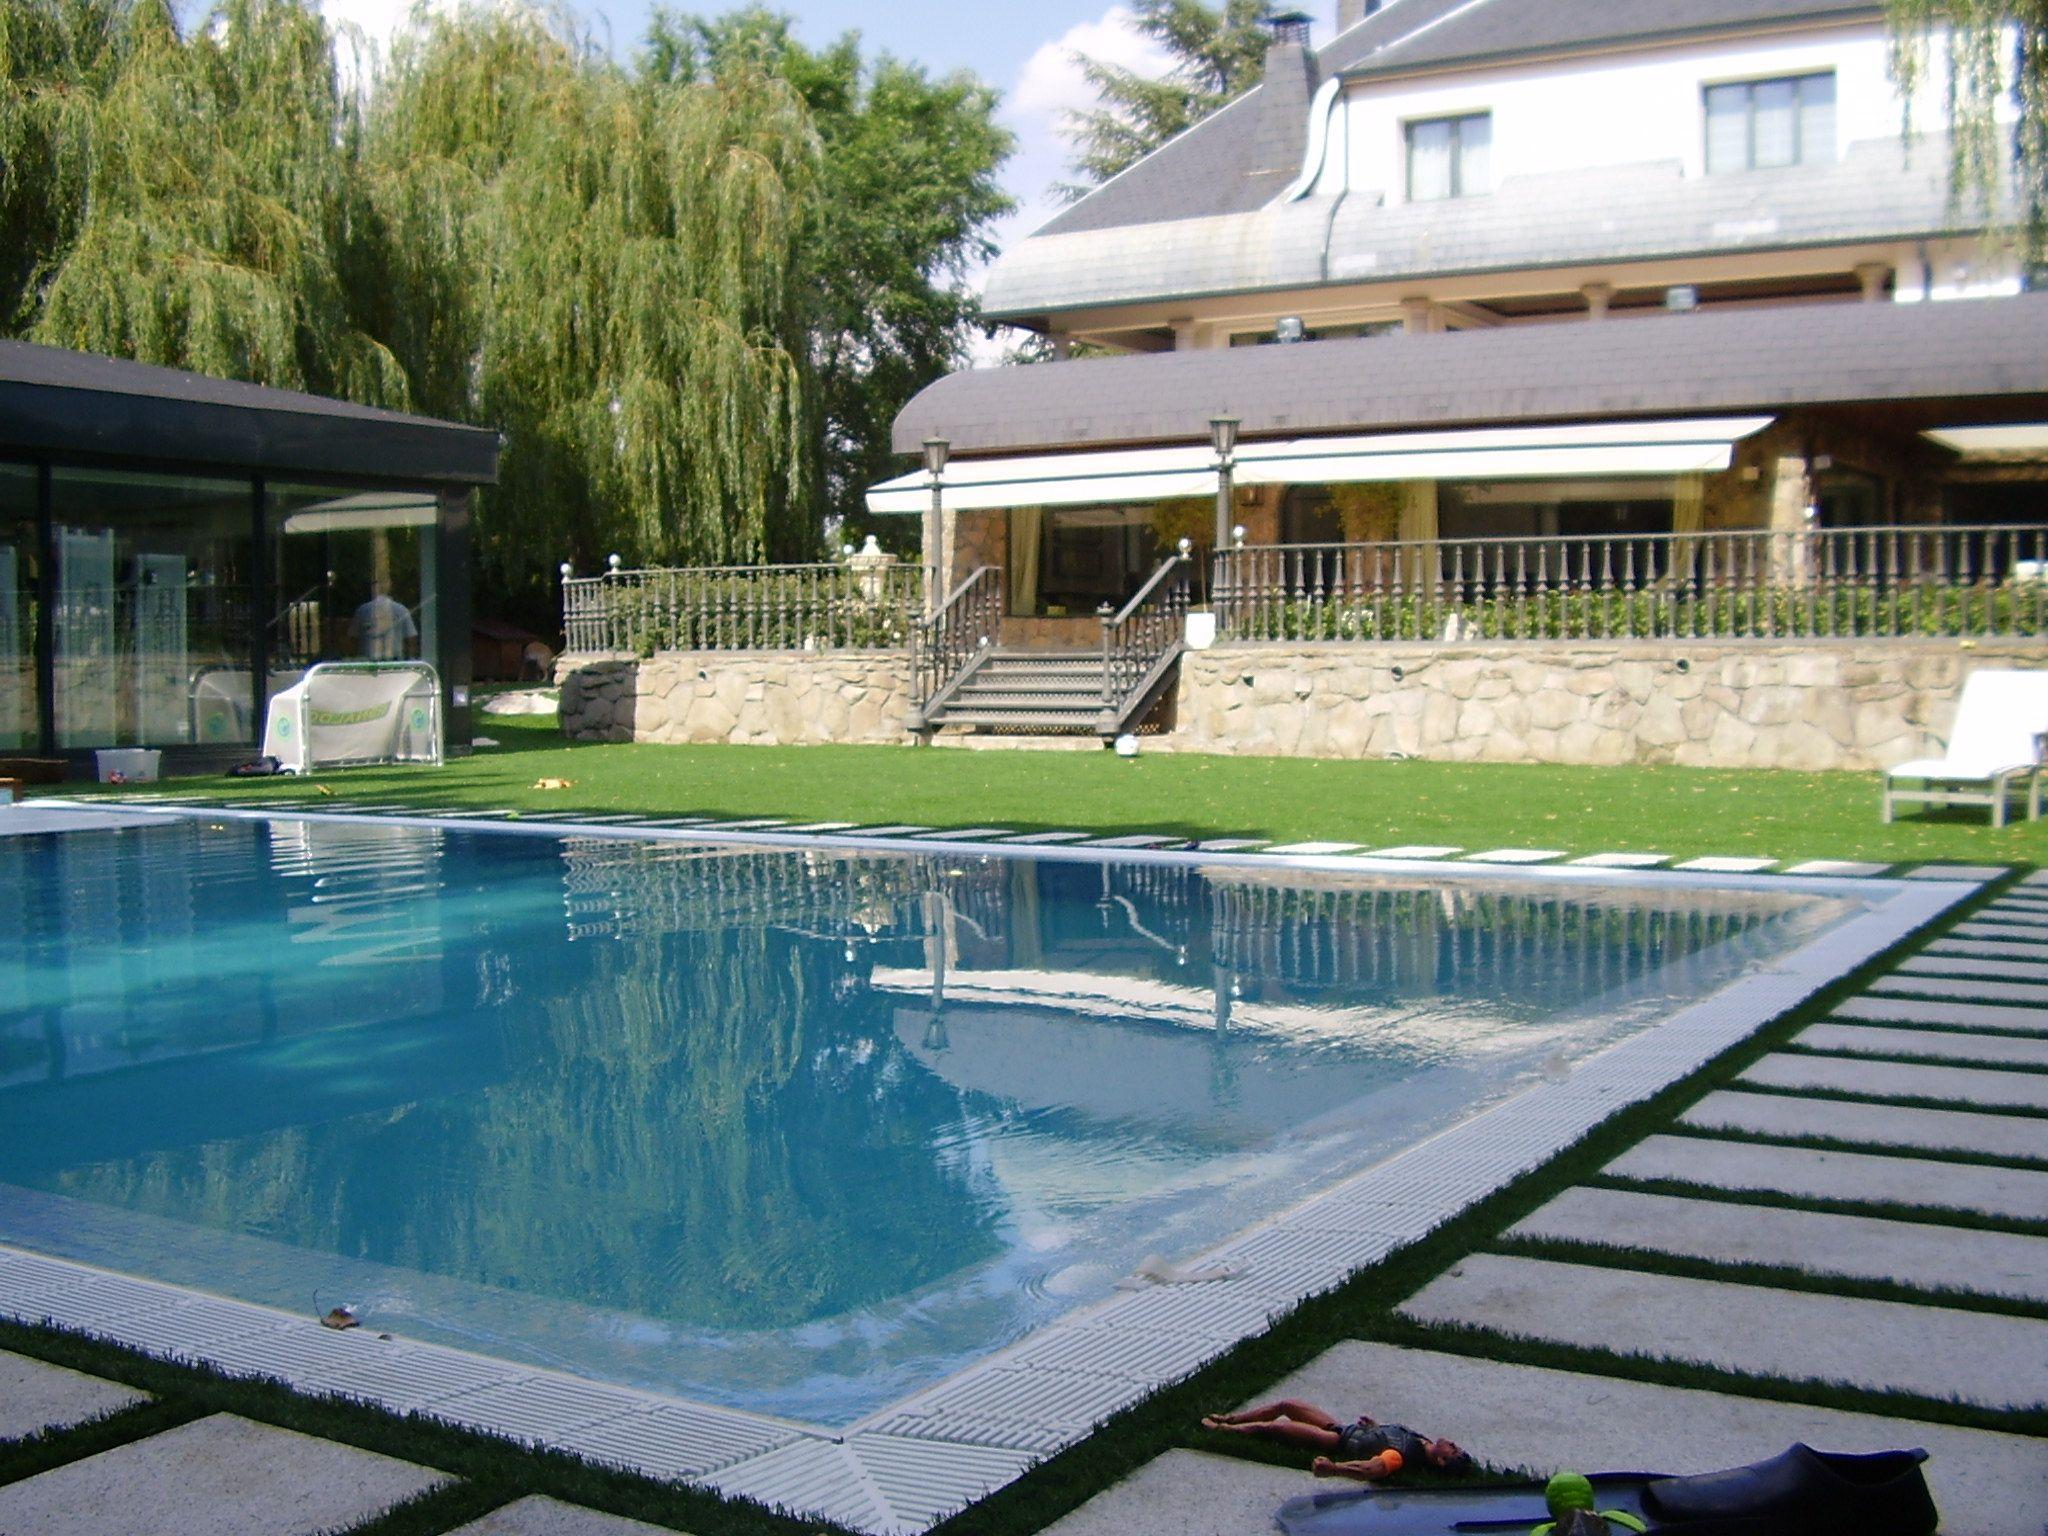 Construcci n de piscina desbordante portfolio piscinas for Construccion piscinas